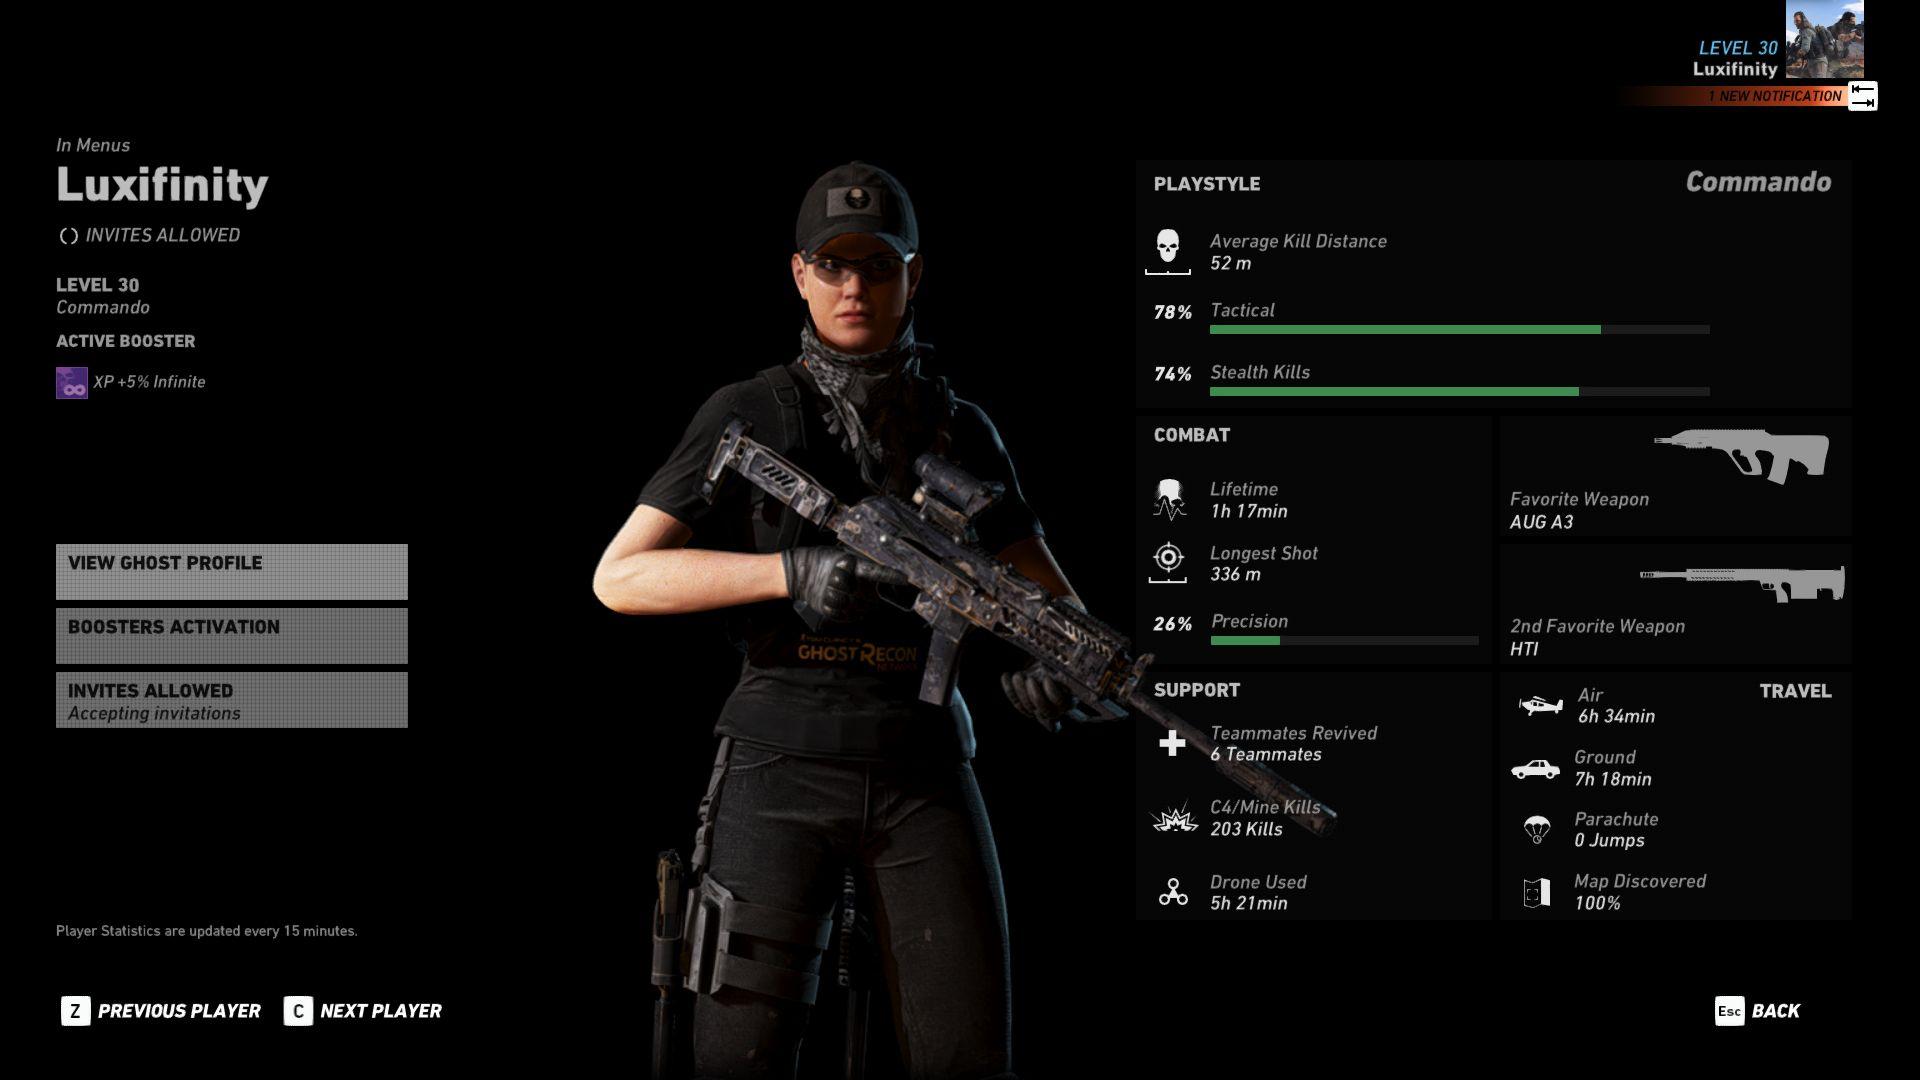 Ghost Recon Wildlands Best Weapons Guide